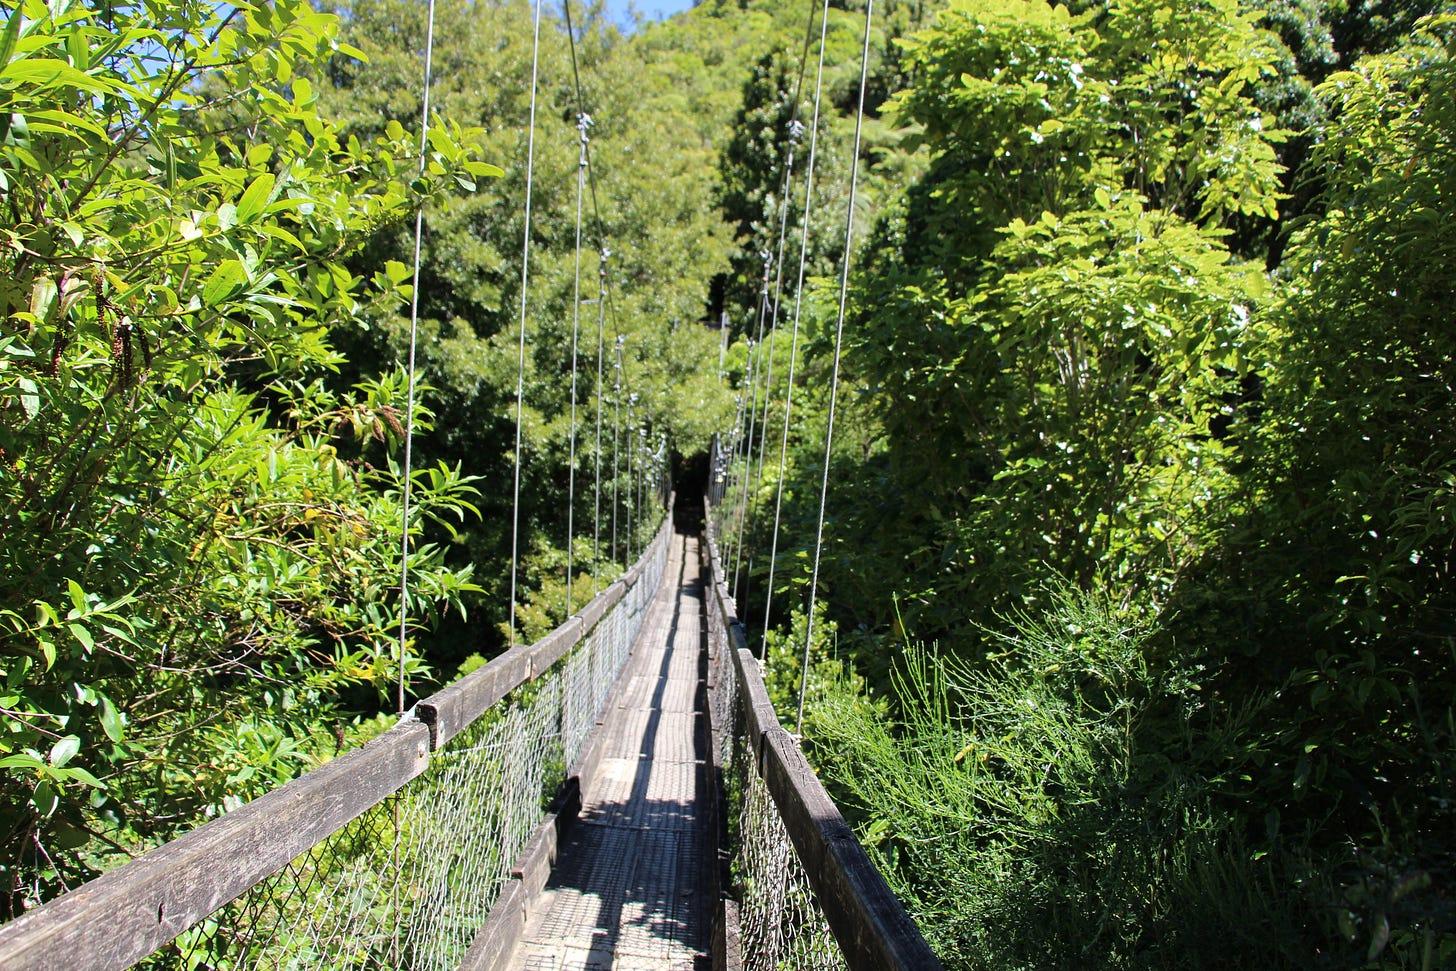 the start of a wooden swing bridge